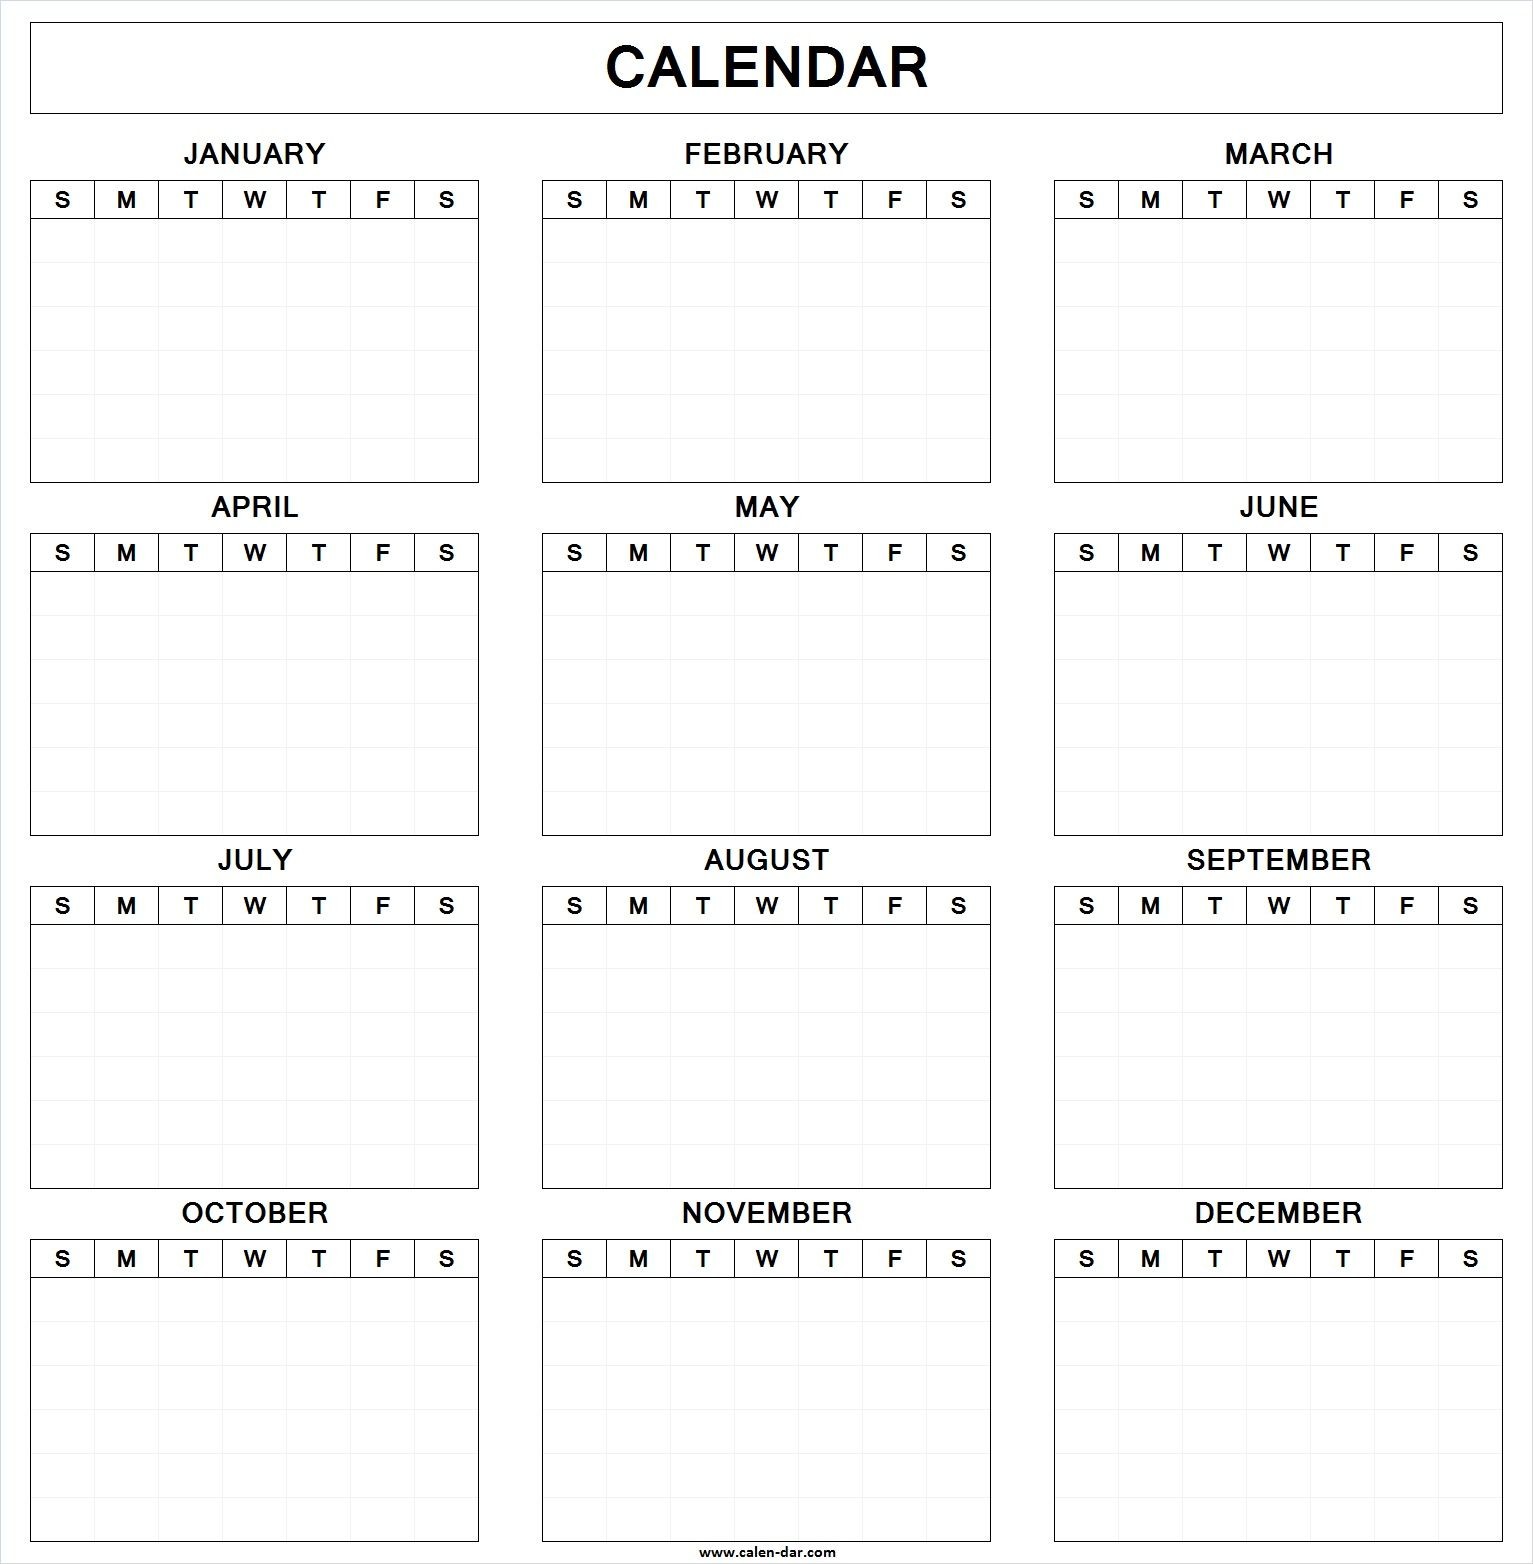 Blank Yearly Calendar Template 2018 | Home decor | Pinterest ...